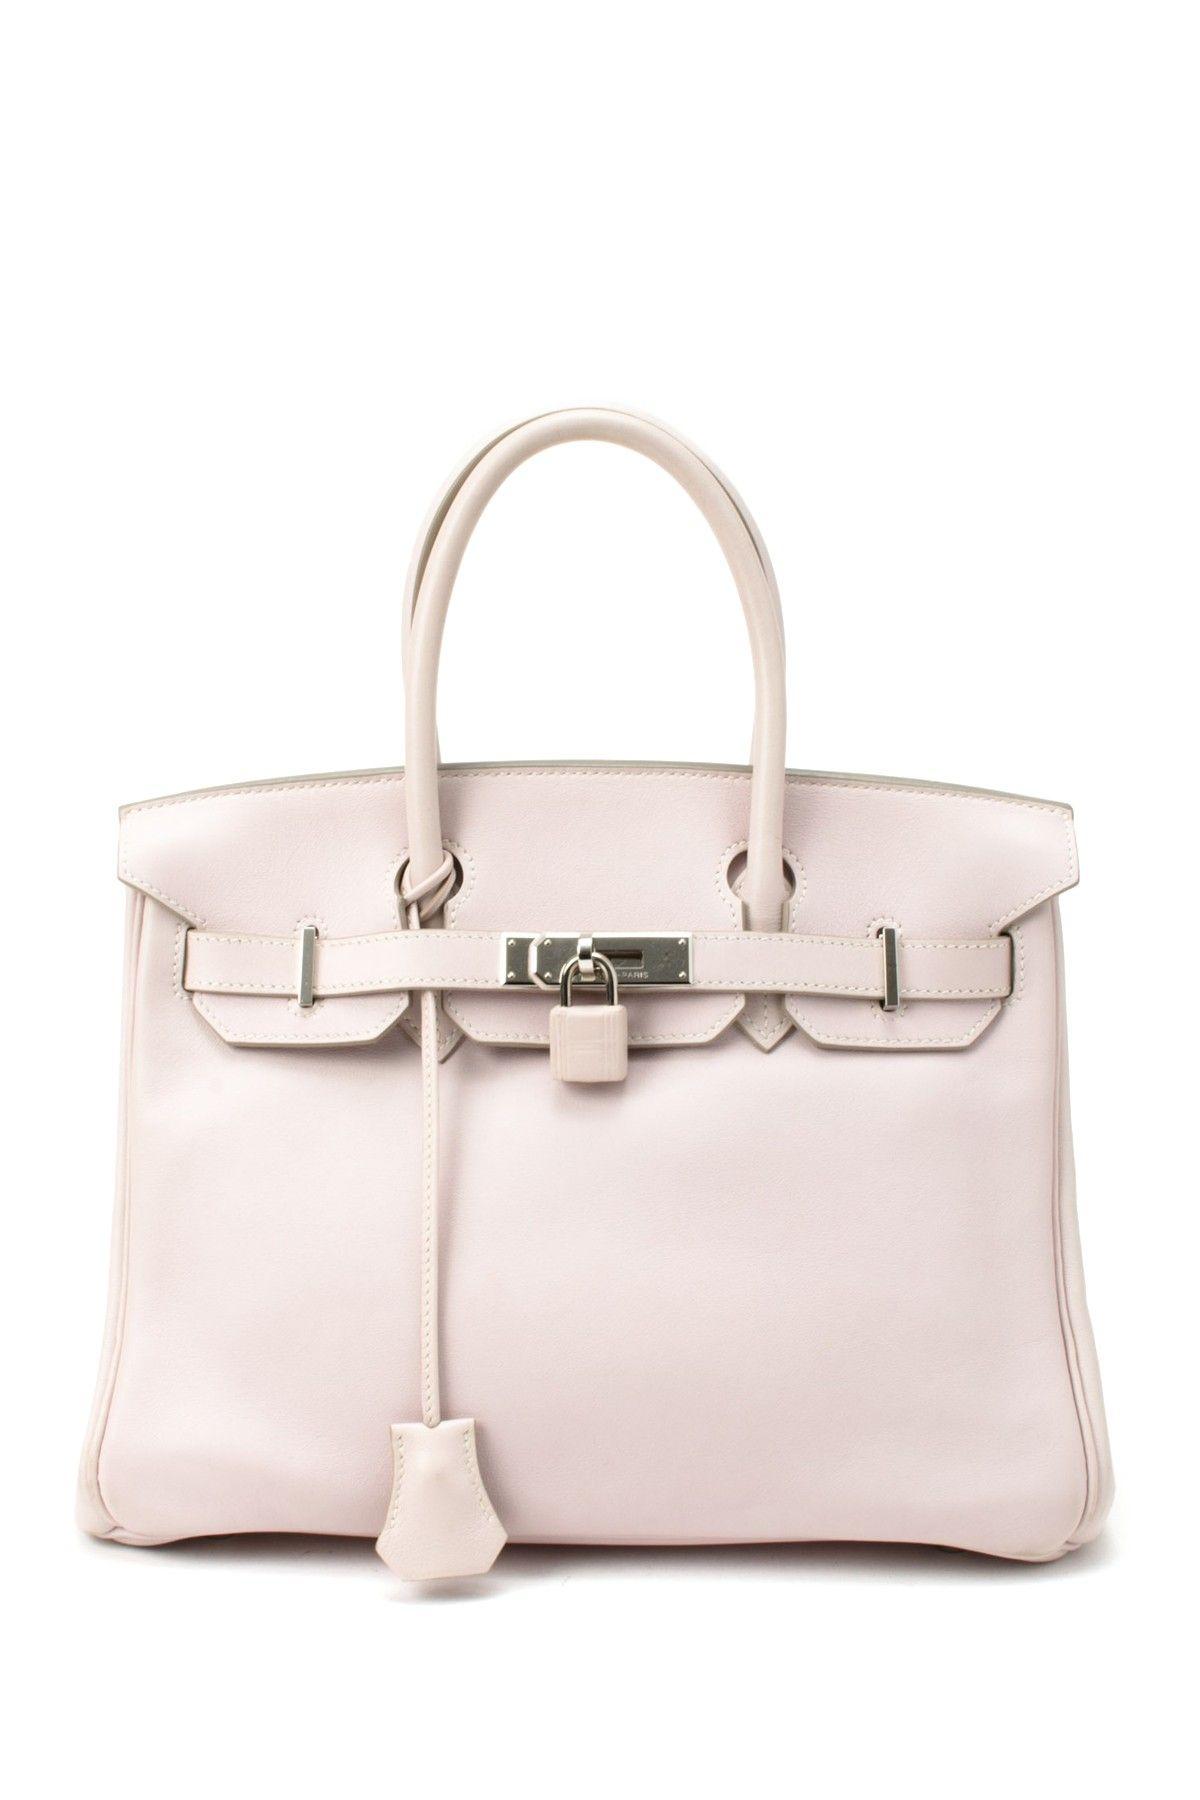 fa744e5256b HauteLook   Vintage Bags  Hermes, Louis Vuitton   More  Vintage Hermes  Birkin 30 (Stamp  Square L, Silver Hardware) Handbag